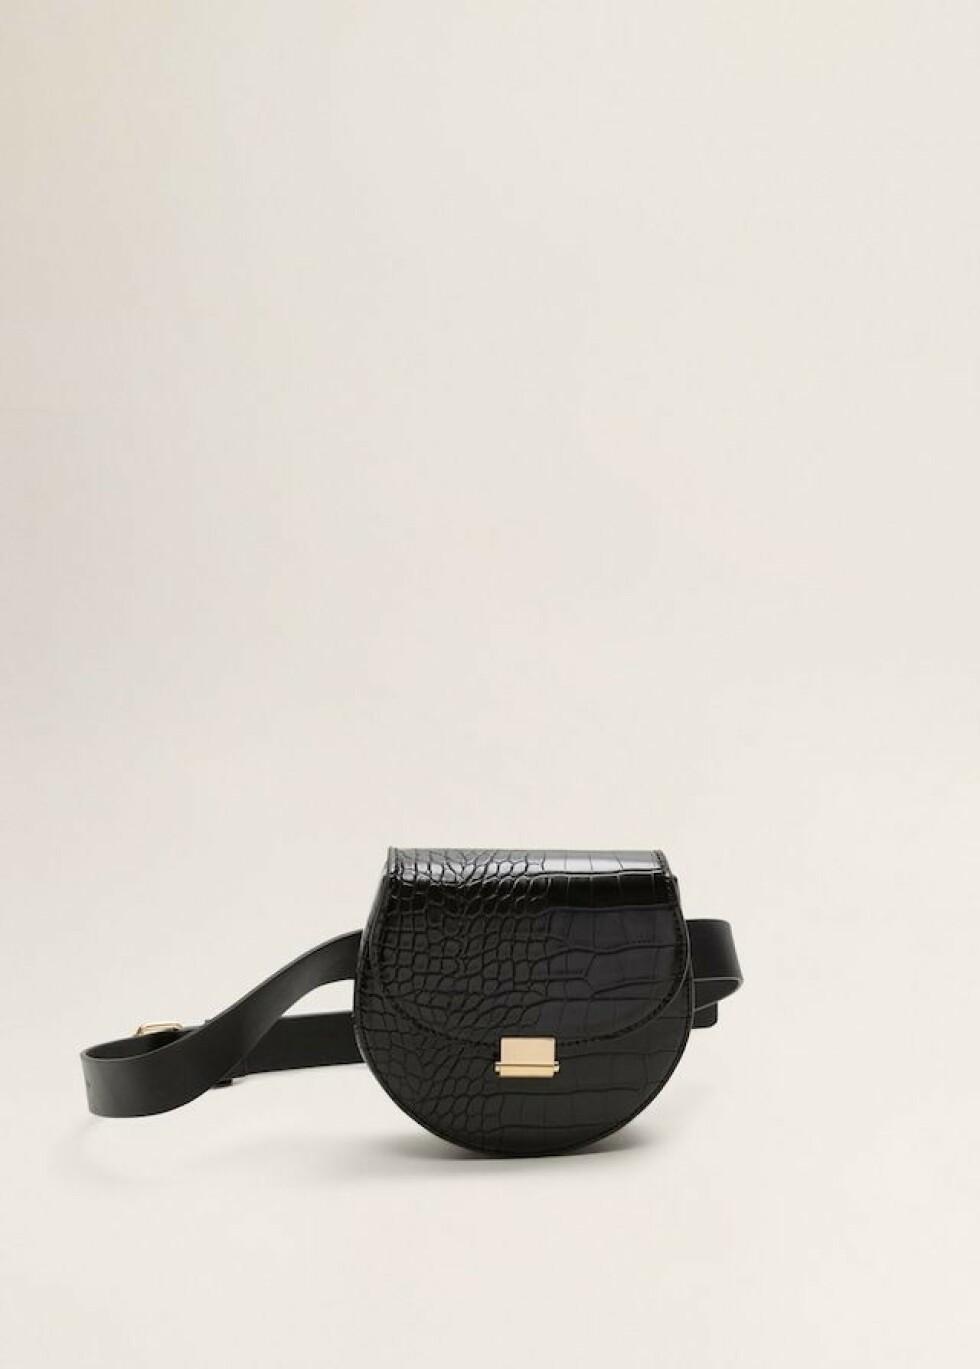 Belteveske fra Mango |199,-| https://shop.mango.com/no-en/women/bags-money-belts/animal-print-belt-bag_43050819.html?c=99&n=1&s=accesorios_she.accesorio;40,340,440